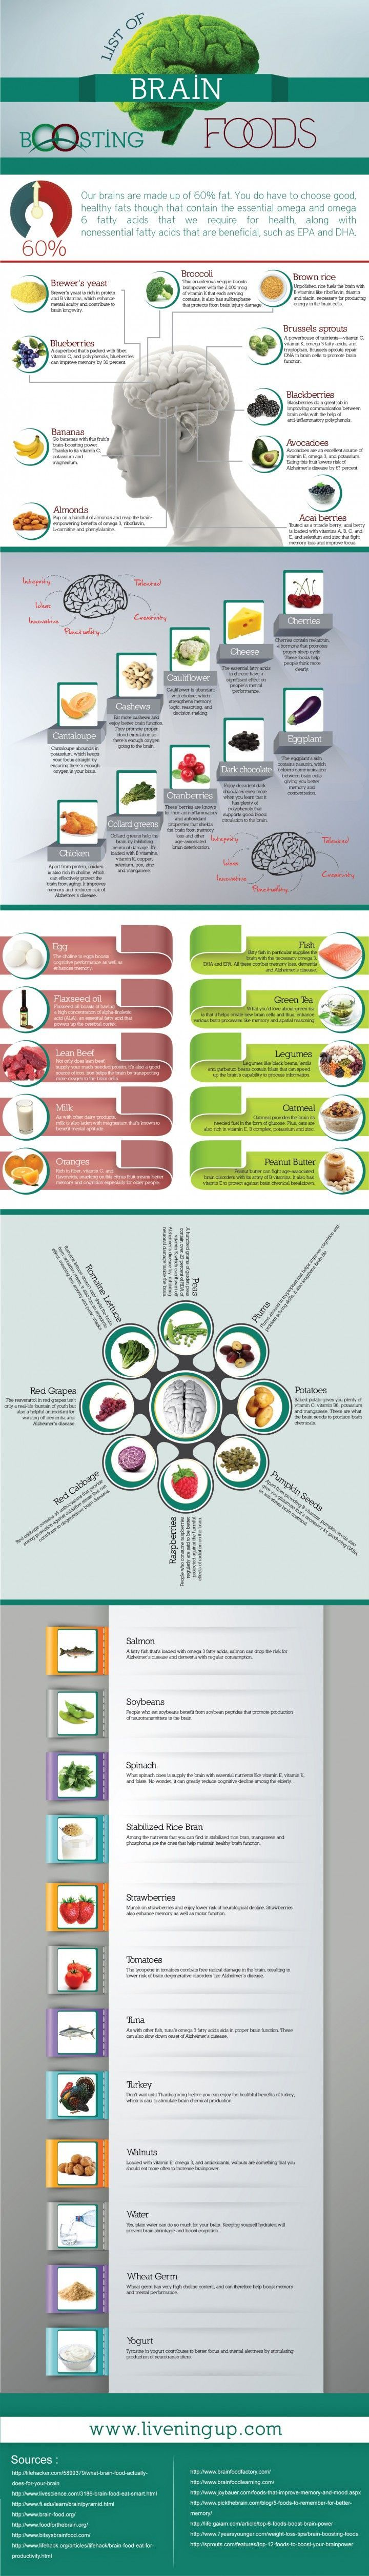 http://miricbiotechltd.onsugar.com/miric-biotech-miric-biotech-ltd-miric-biotech-limited-37774724 #miricbiotech #miricbiotechltd #miricbiotechlimited